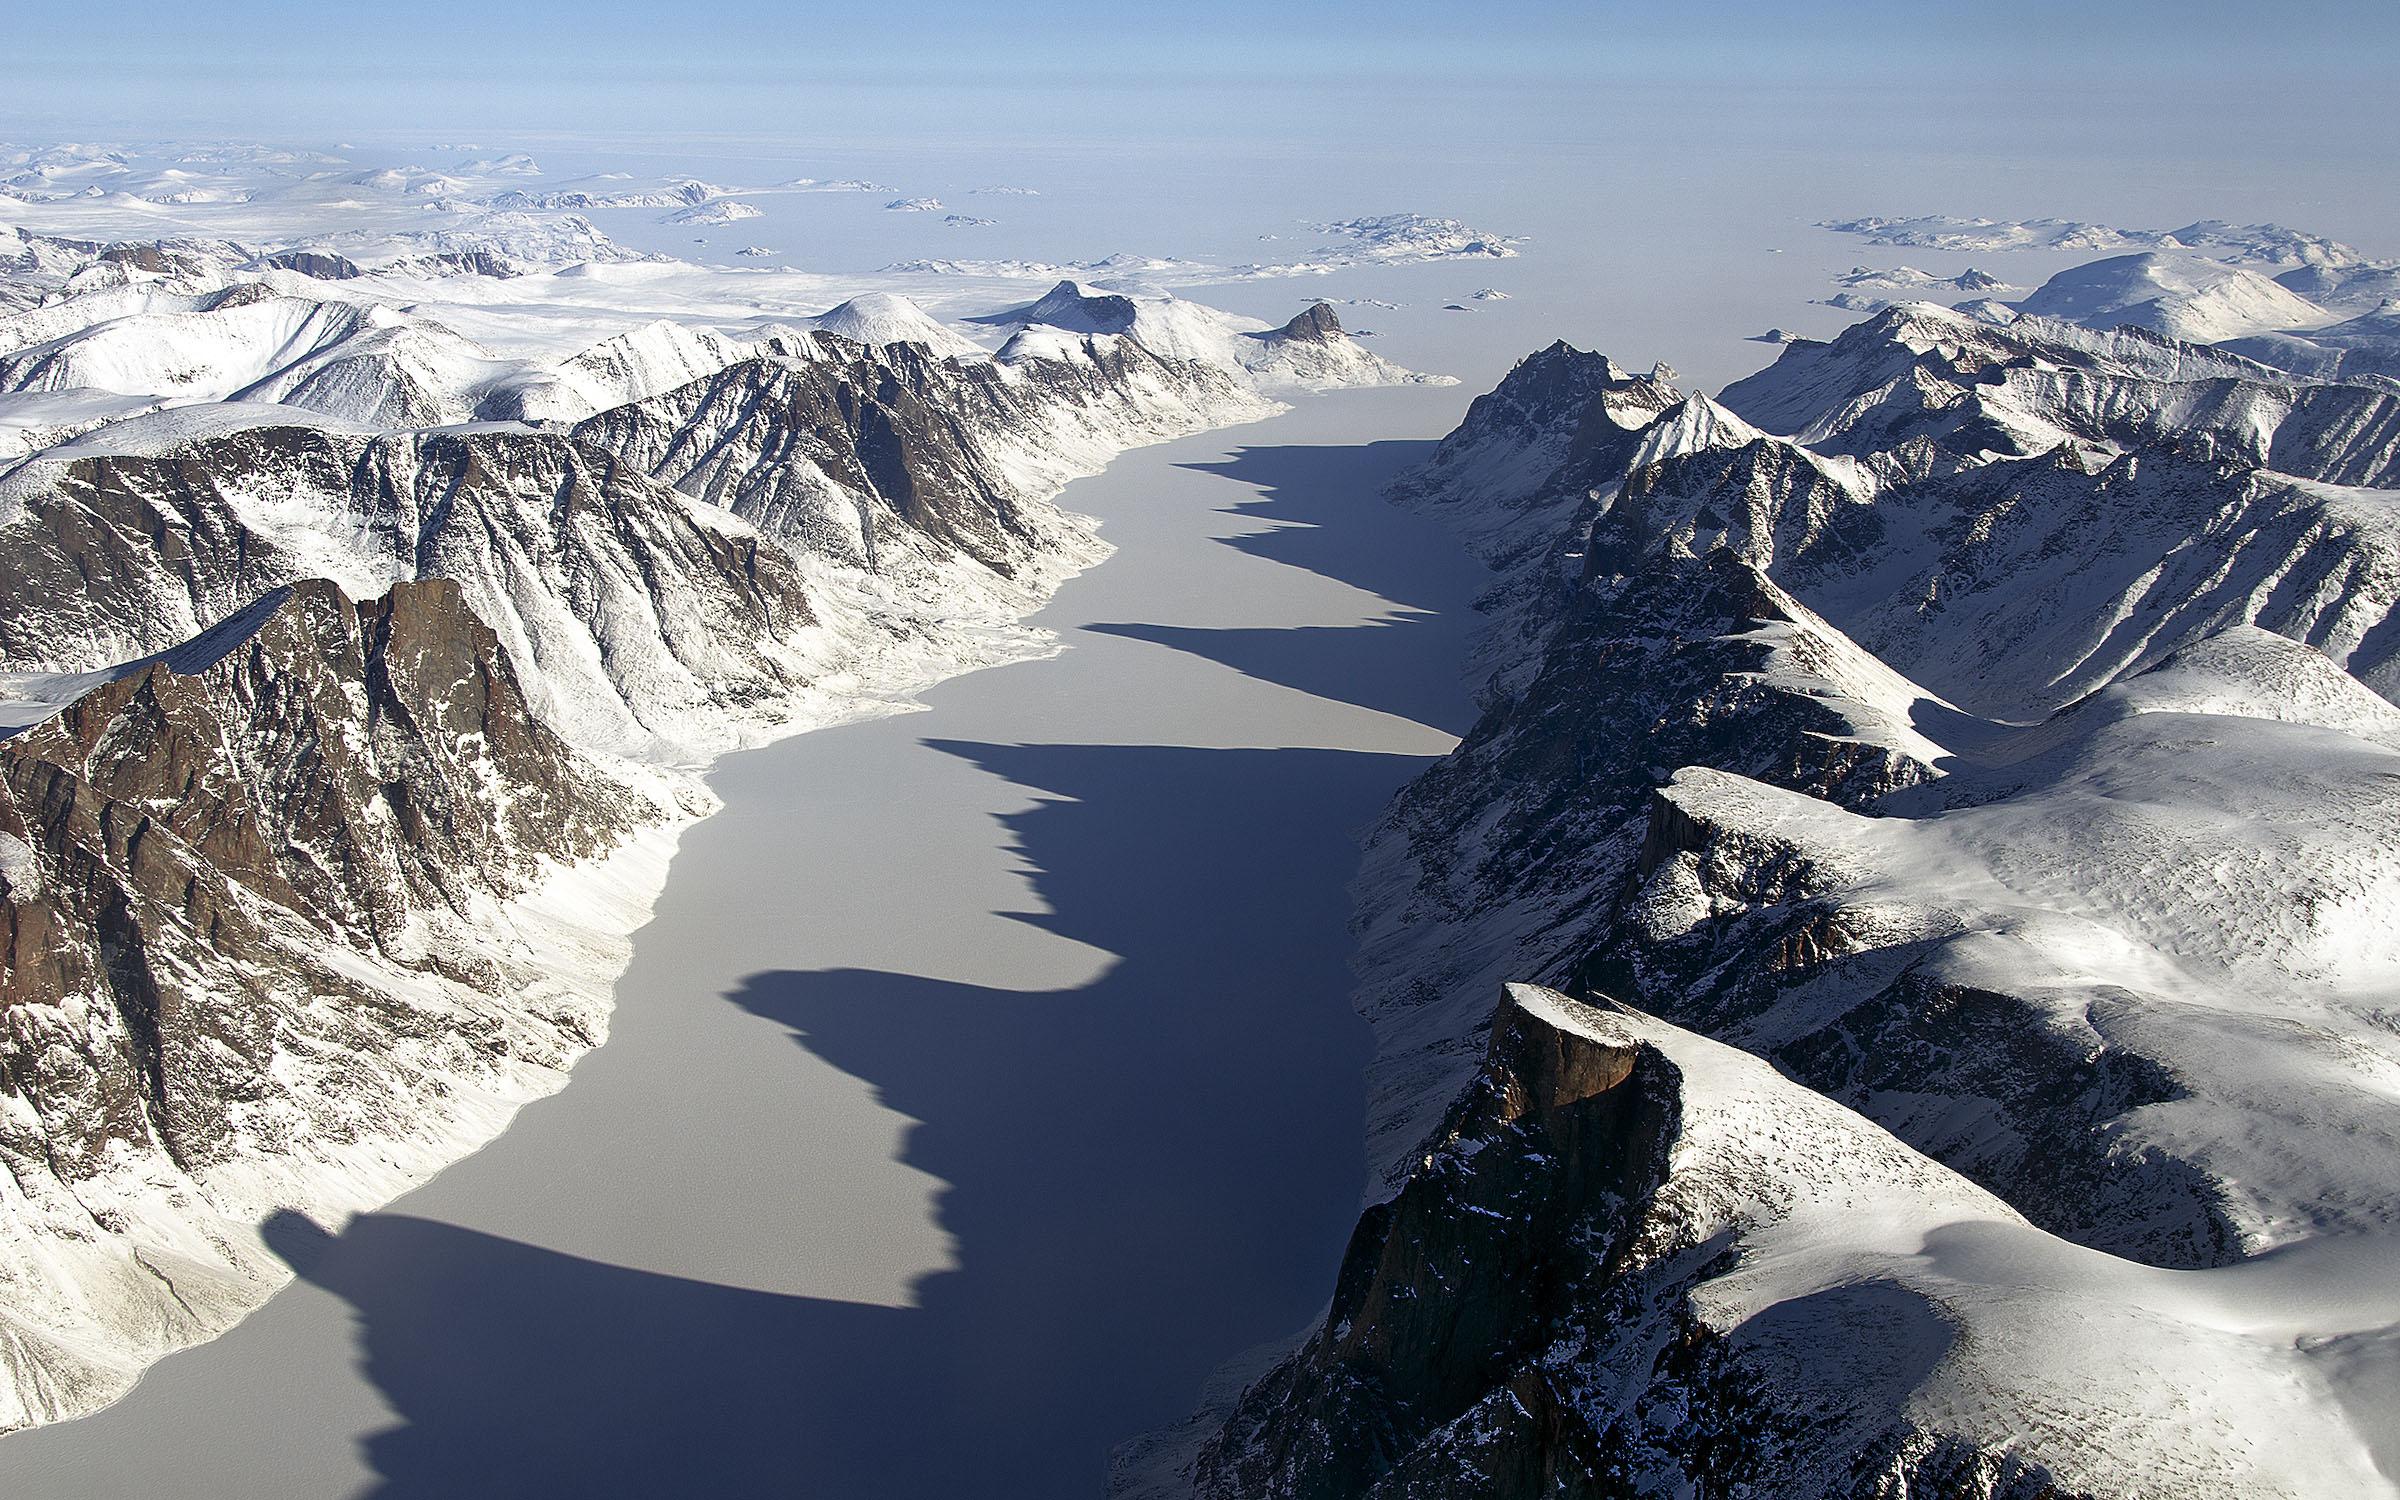 kanadische Arktis (Baffininsel, Ellesmere-Insel, Beechey-Insel, Devon-Insel, Victoria-Insel)